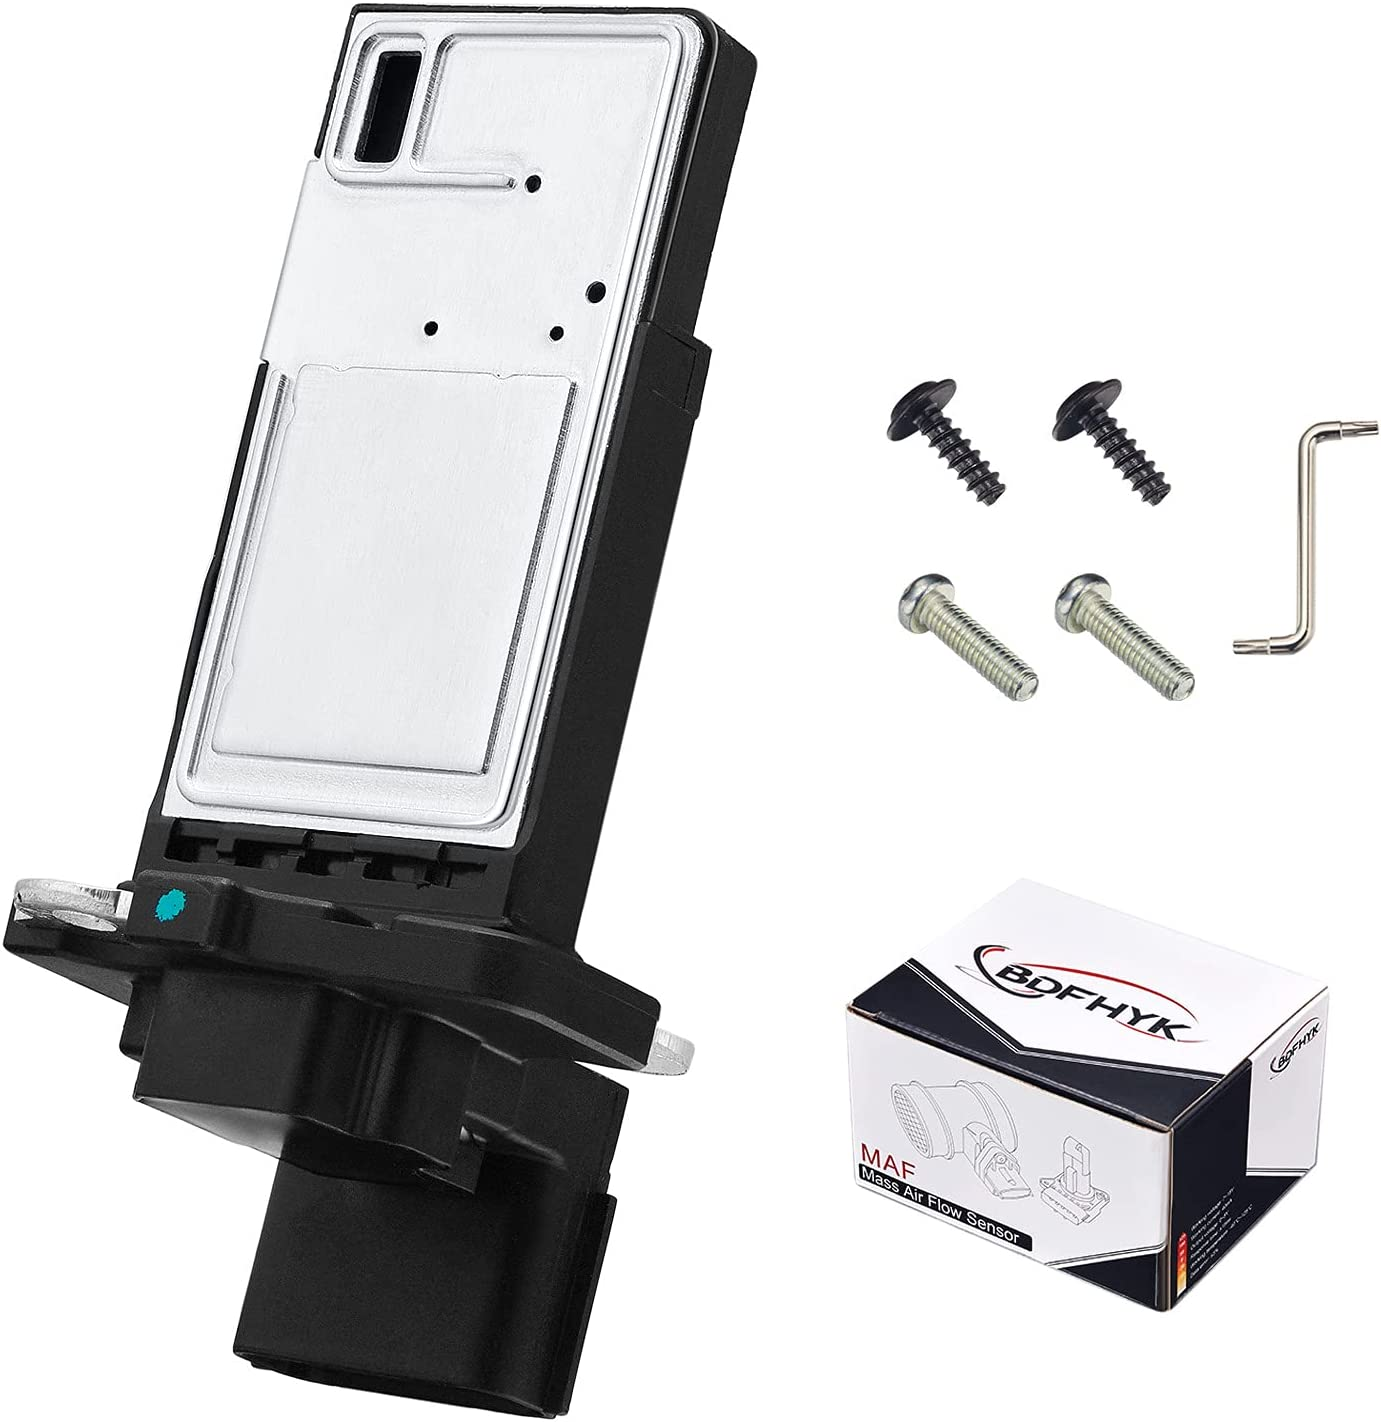 Special price BDFHYK Mass Air Flow Sensor 22895480 20787043 High quality 245-1315 Meter MAF